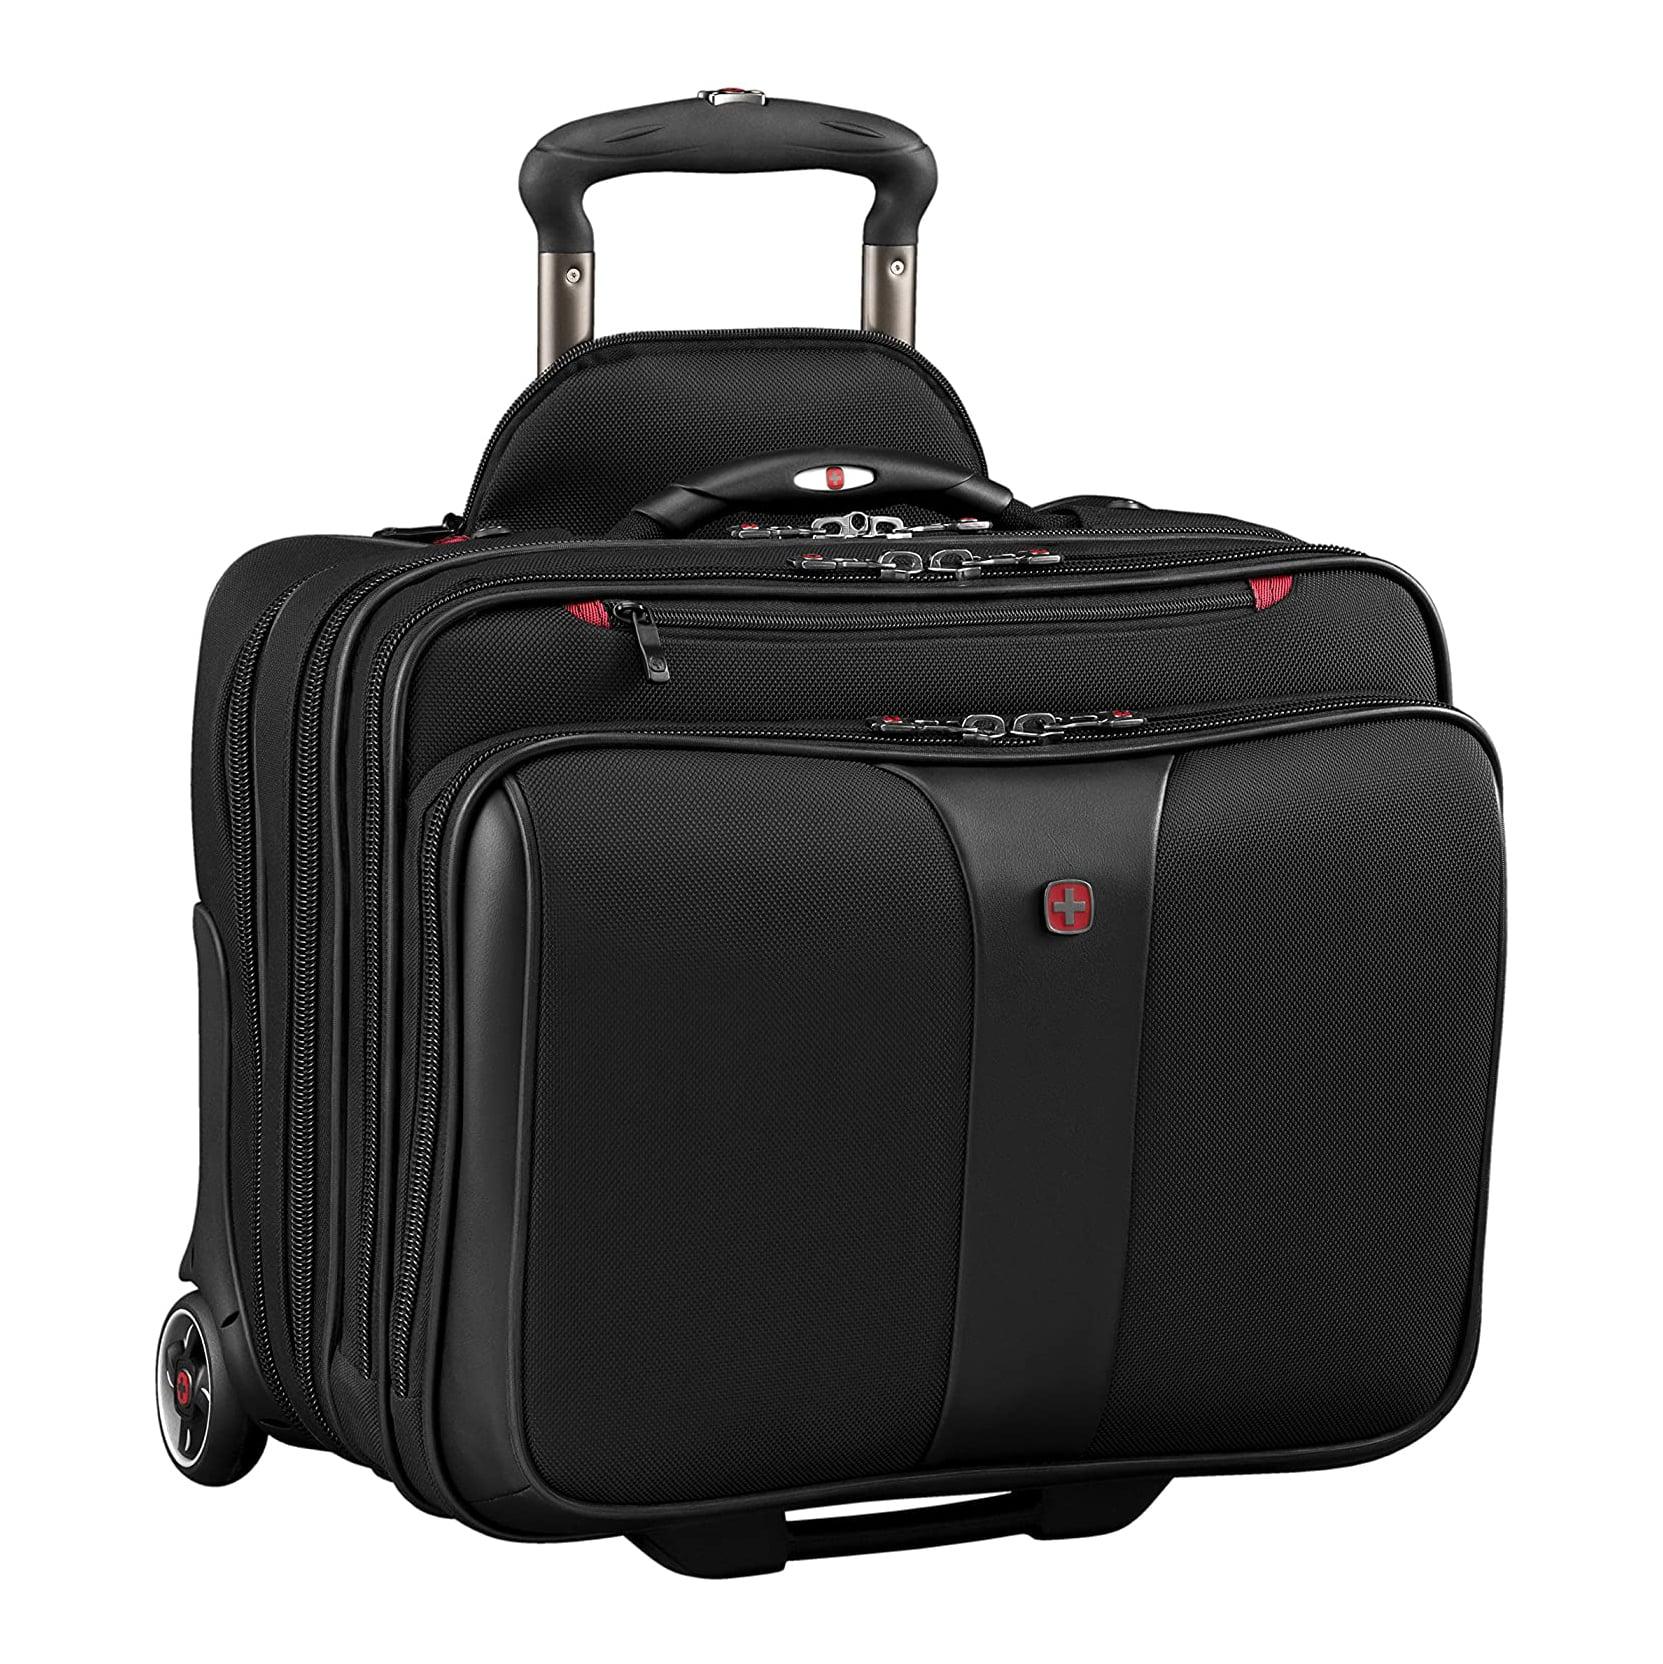 Wenger Luggage Patriot II 2 Slimcase